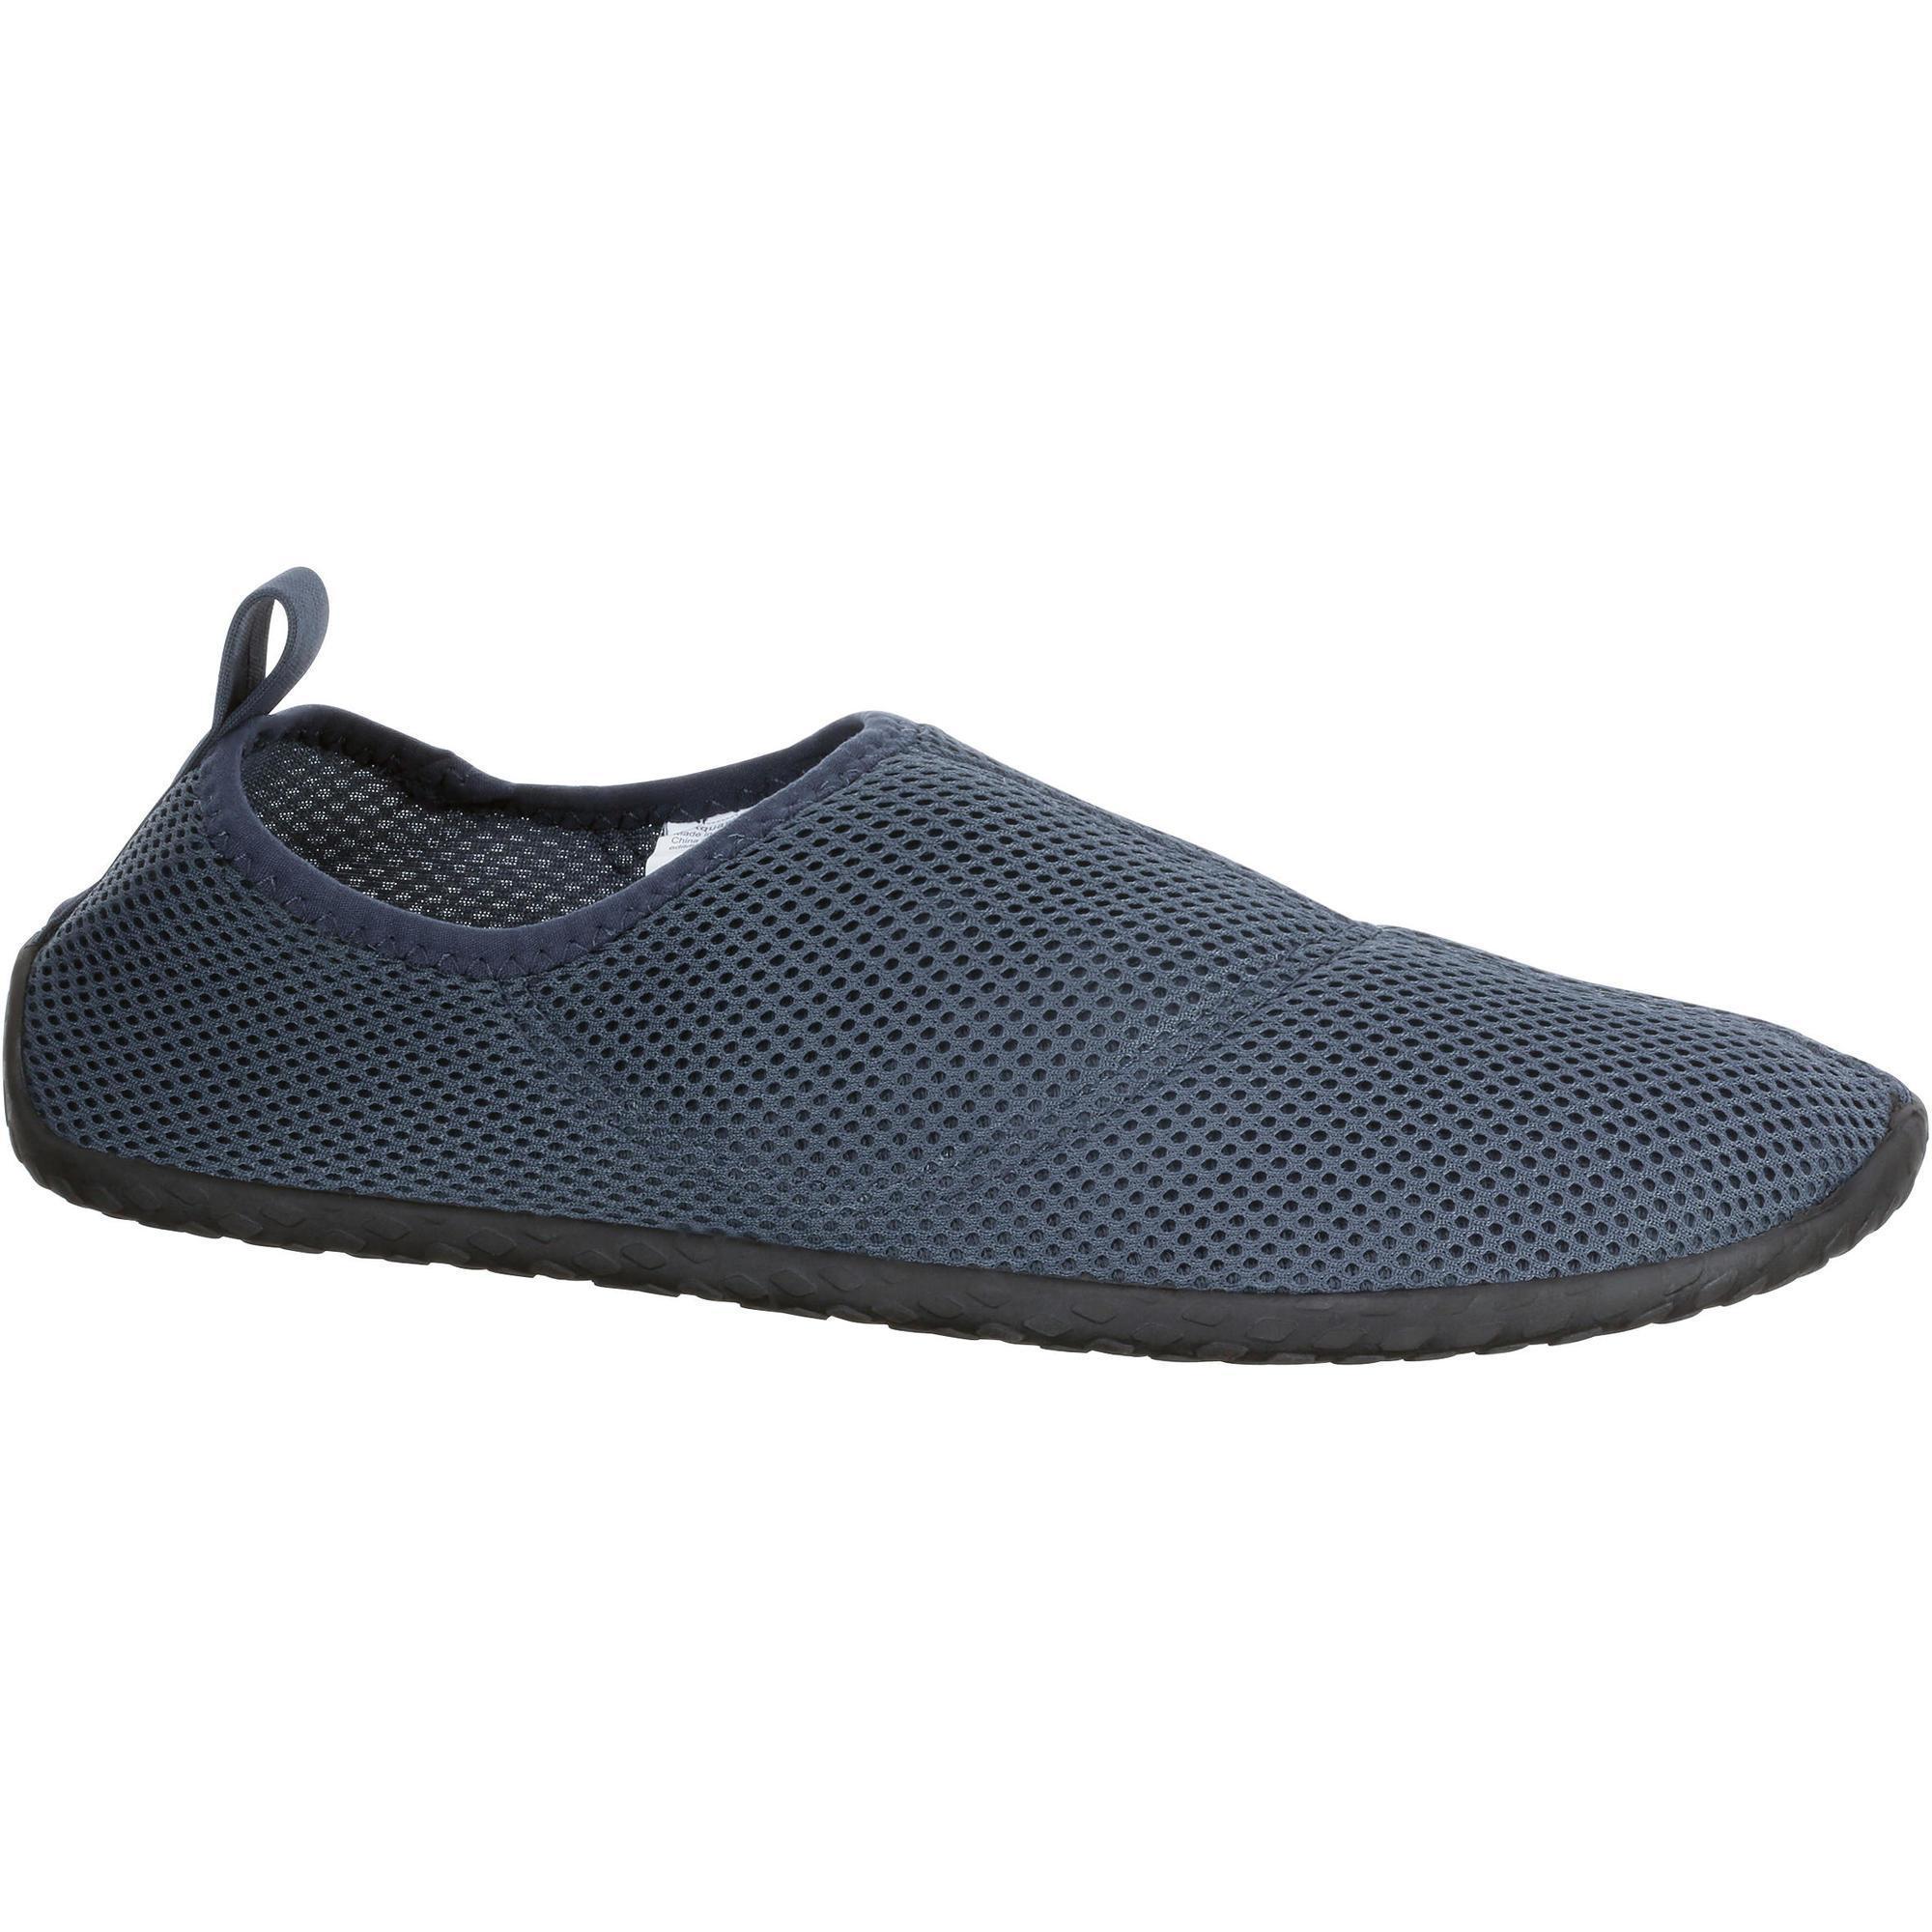 Aquaschuhe 100 Erwachsene | Schuhe > Badeschuhe | Subea